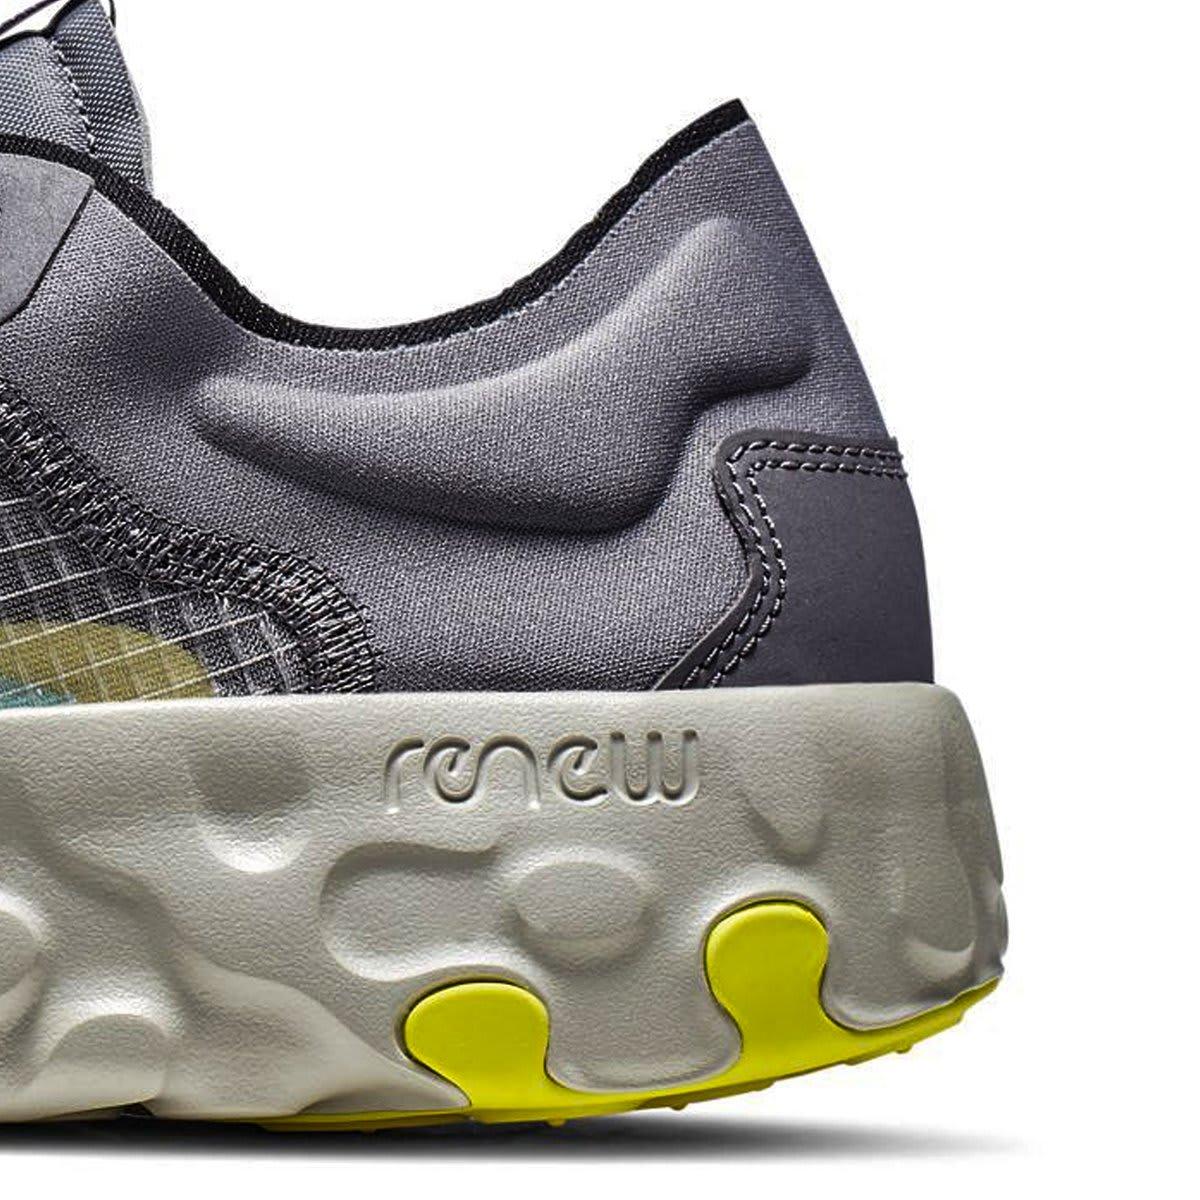 Nike React Renew Runner 'Grey' (Heel)